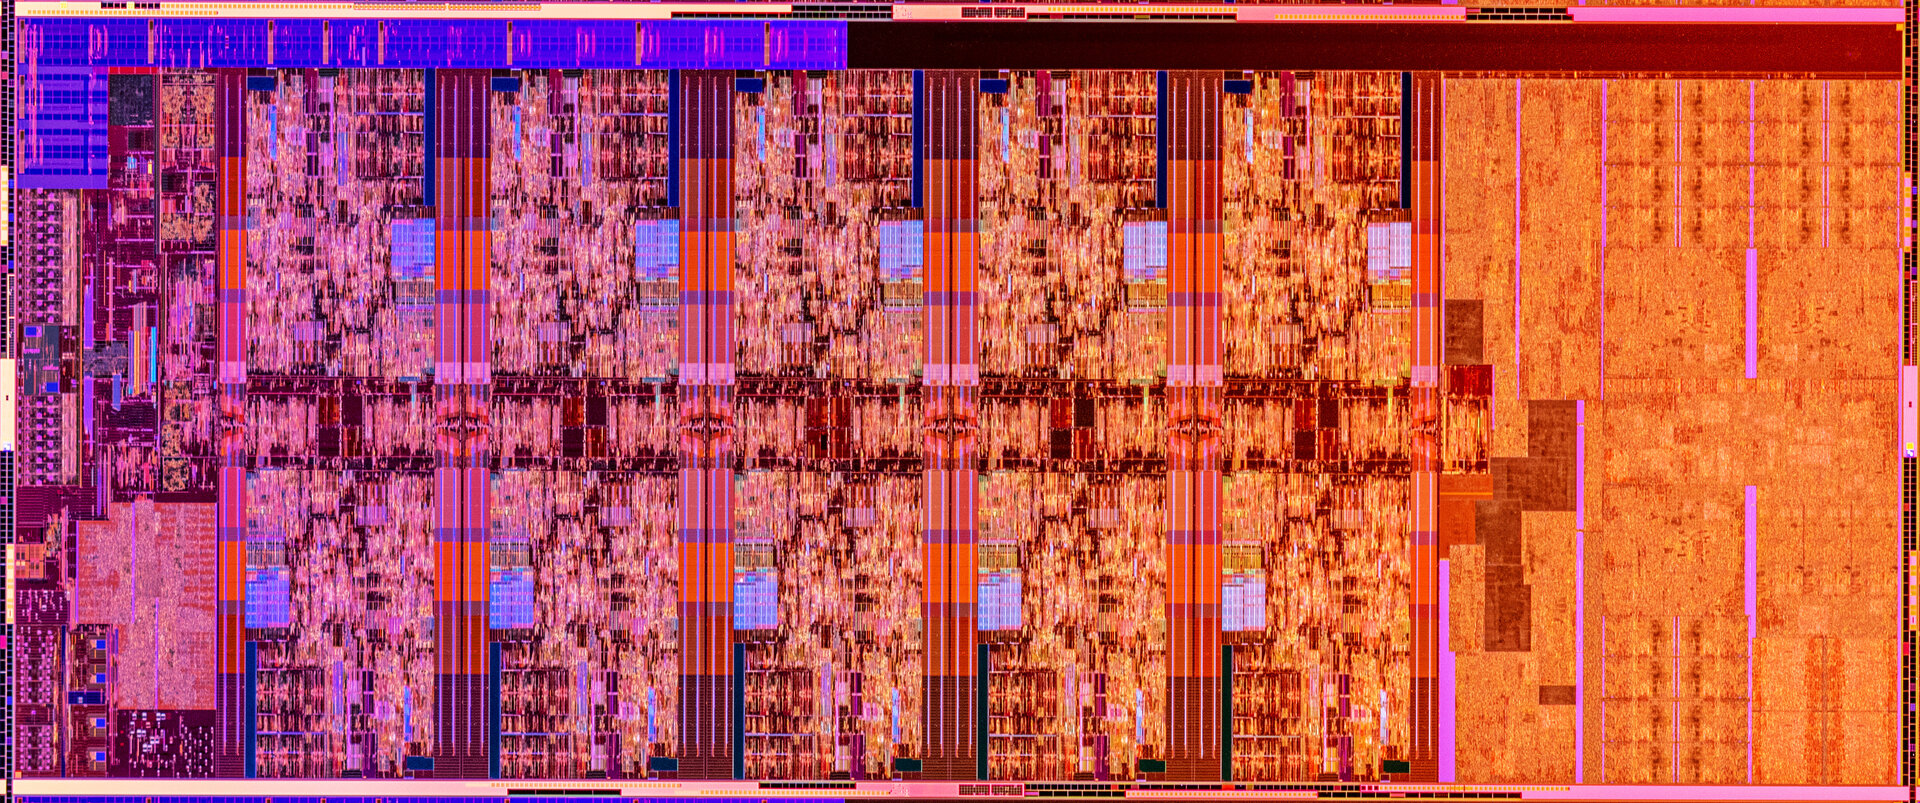 Die-Shot des Intel Comet Lake-S mit zehn Kernen